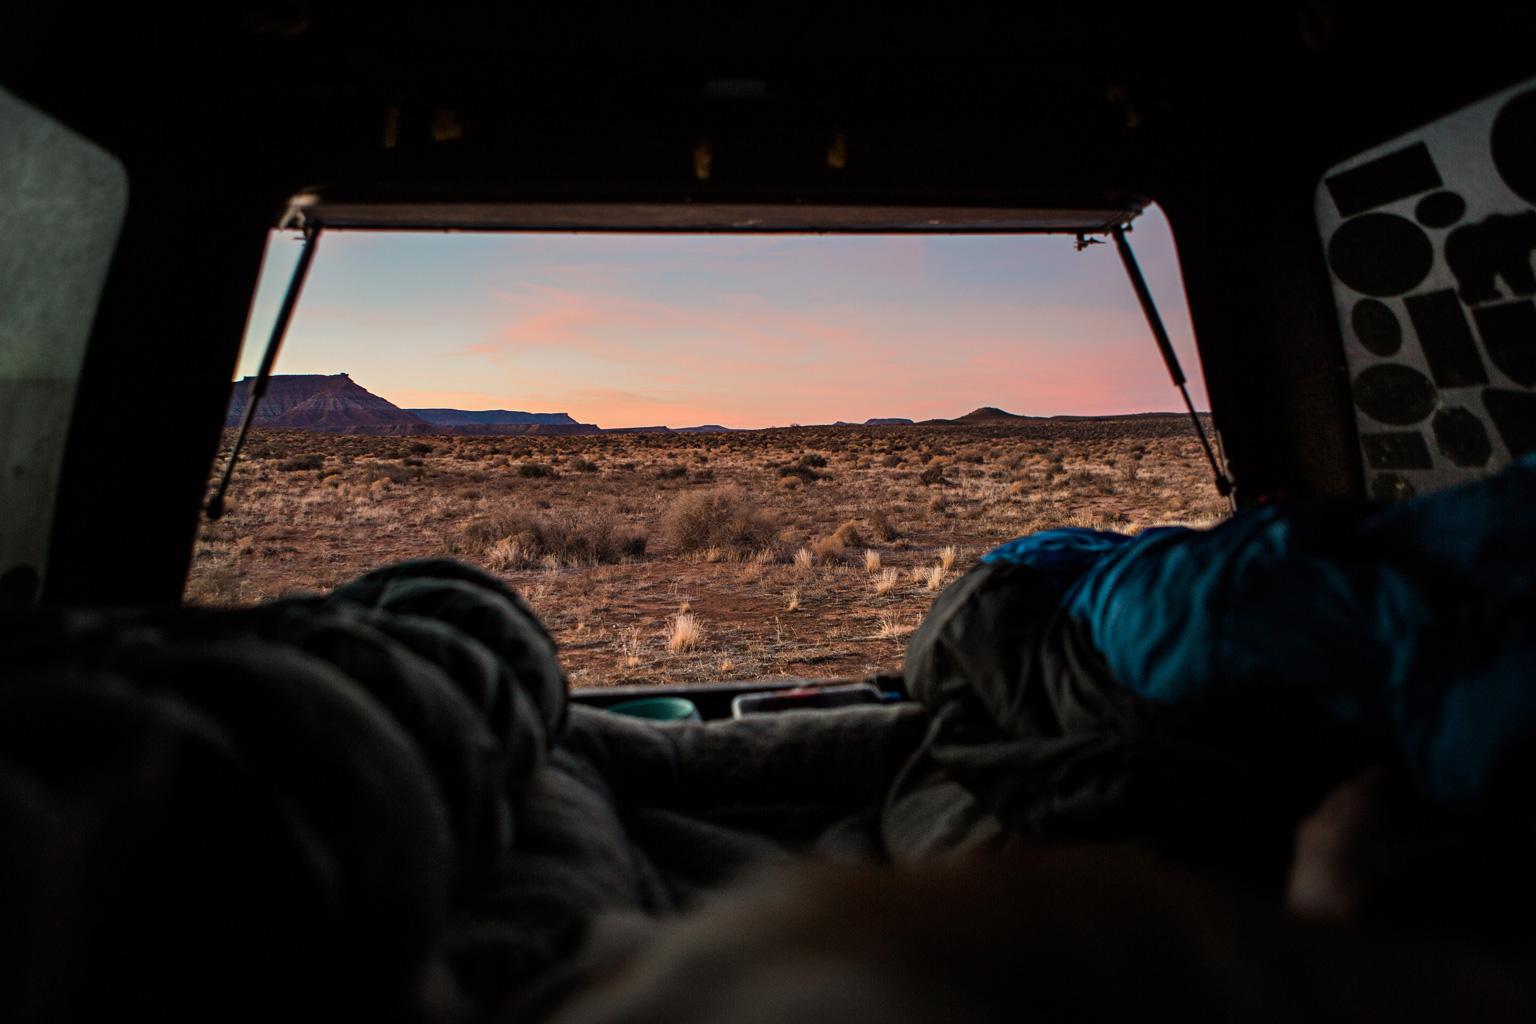 CindyGiovagnoli_Utah_Zion_desert_night_morning_coffee_blm_land_off_grid-004.jpg